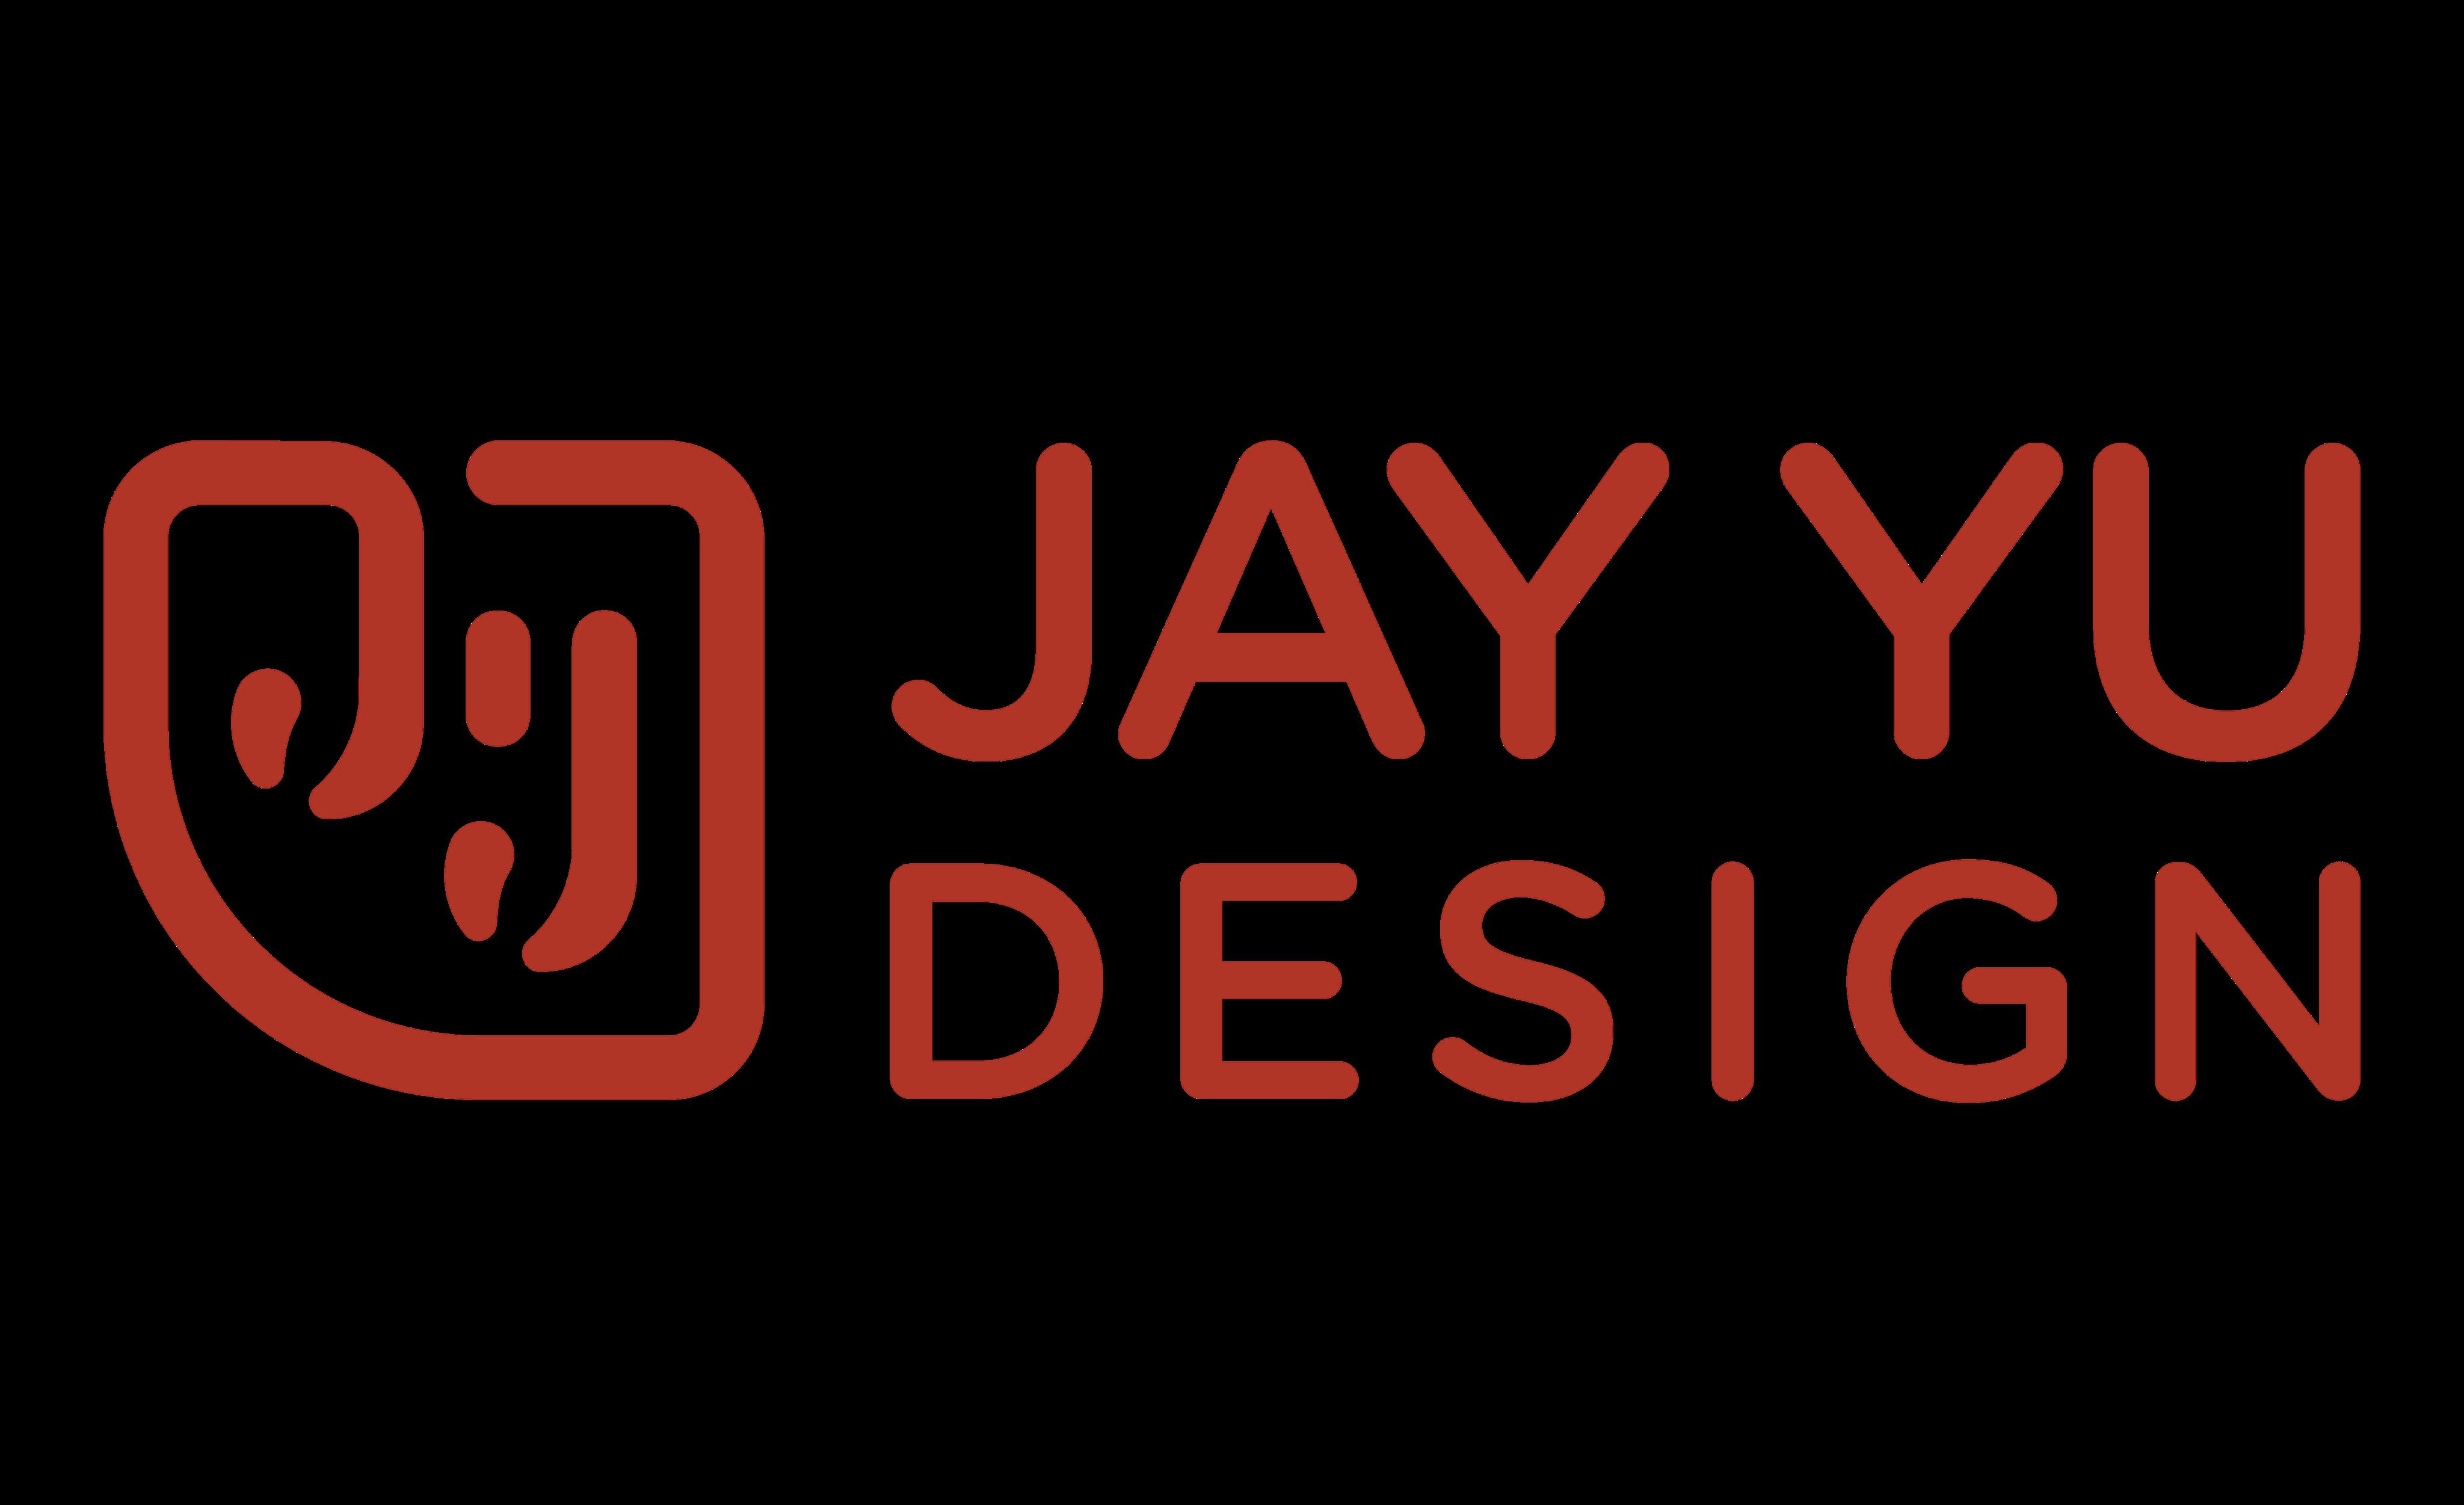 Jay Yu Design